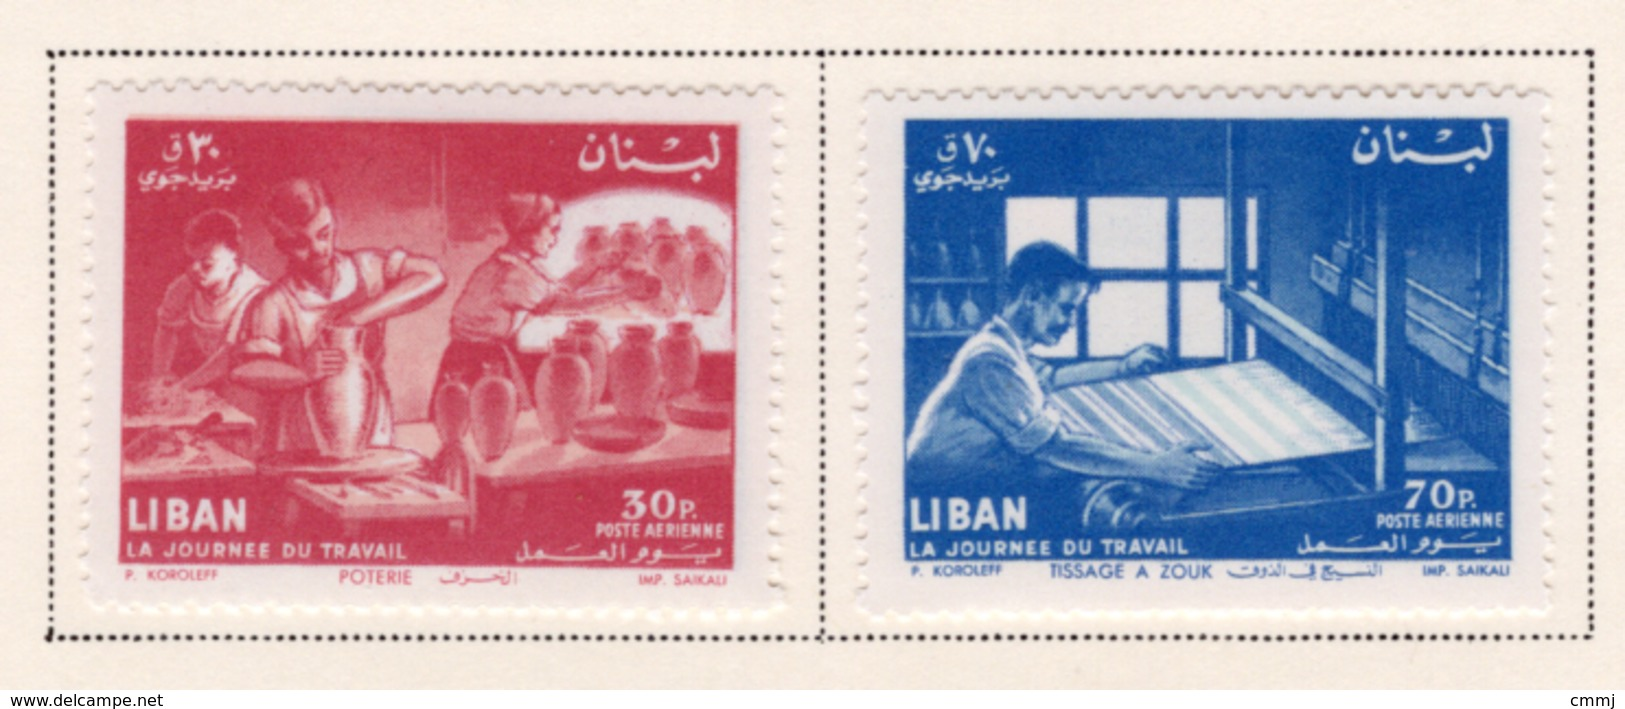 1961 - LIBANO - LEBANON - Mi. Nr. 718/719 - LH -  (S03052019.....) - Libano